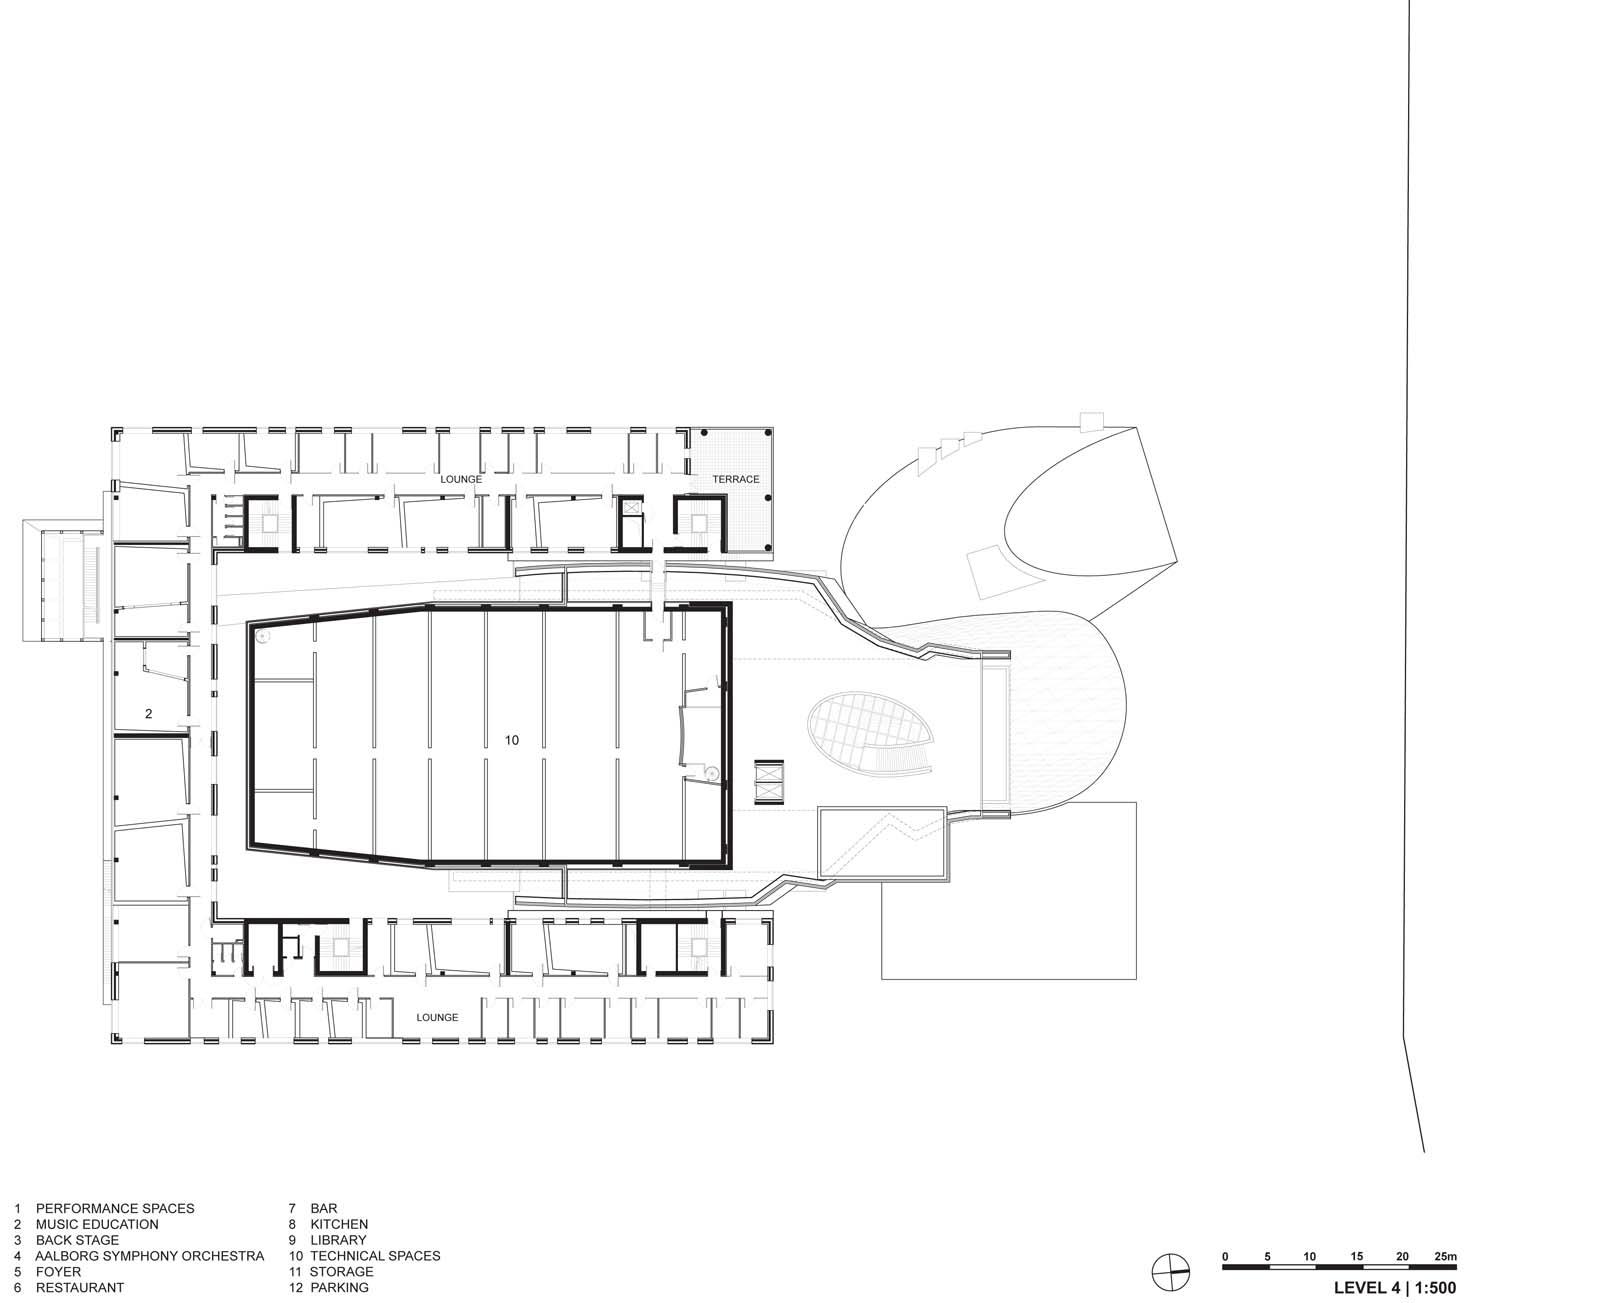 ... Level 4 Plan. (Image U0026copy; Coop Himmelb(l)au)